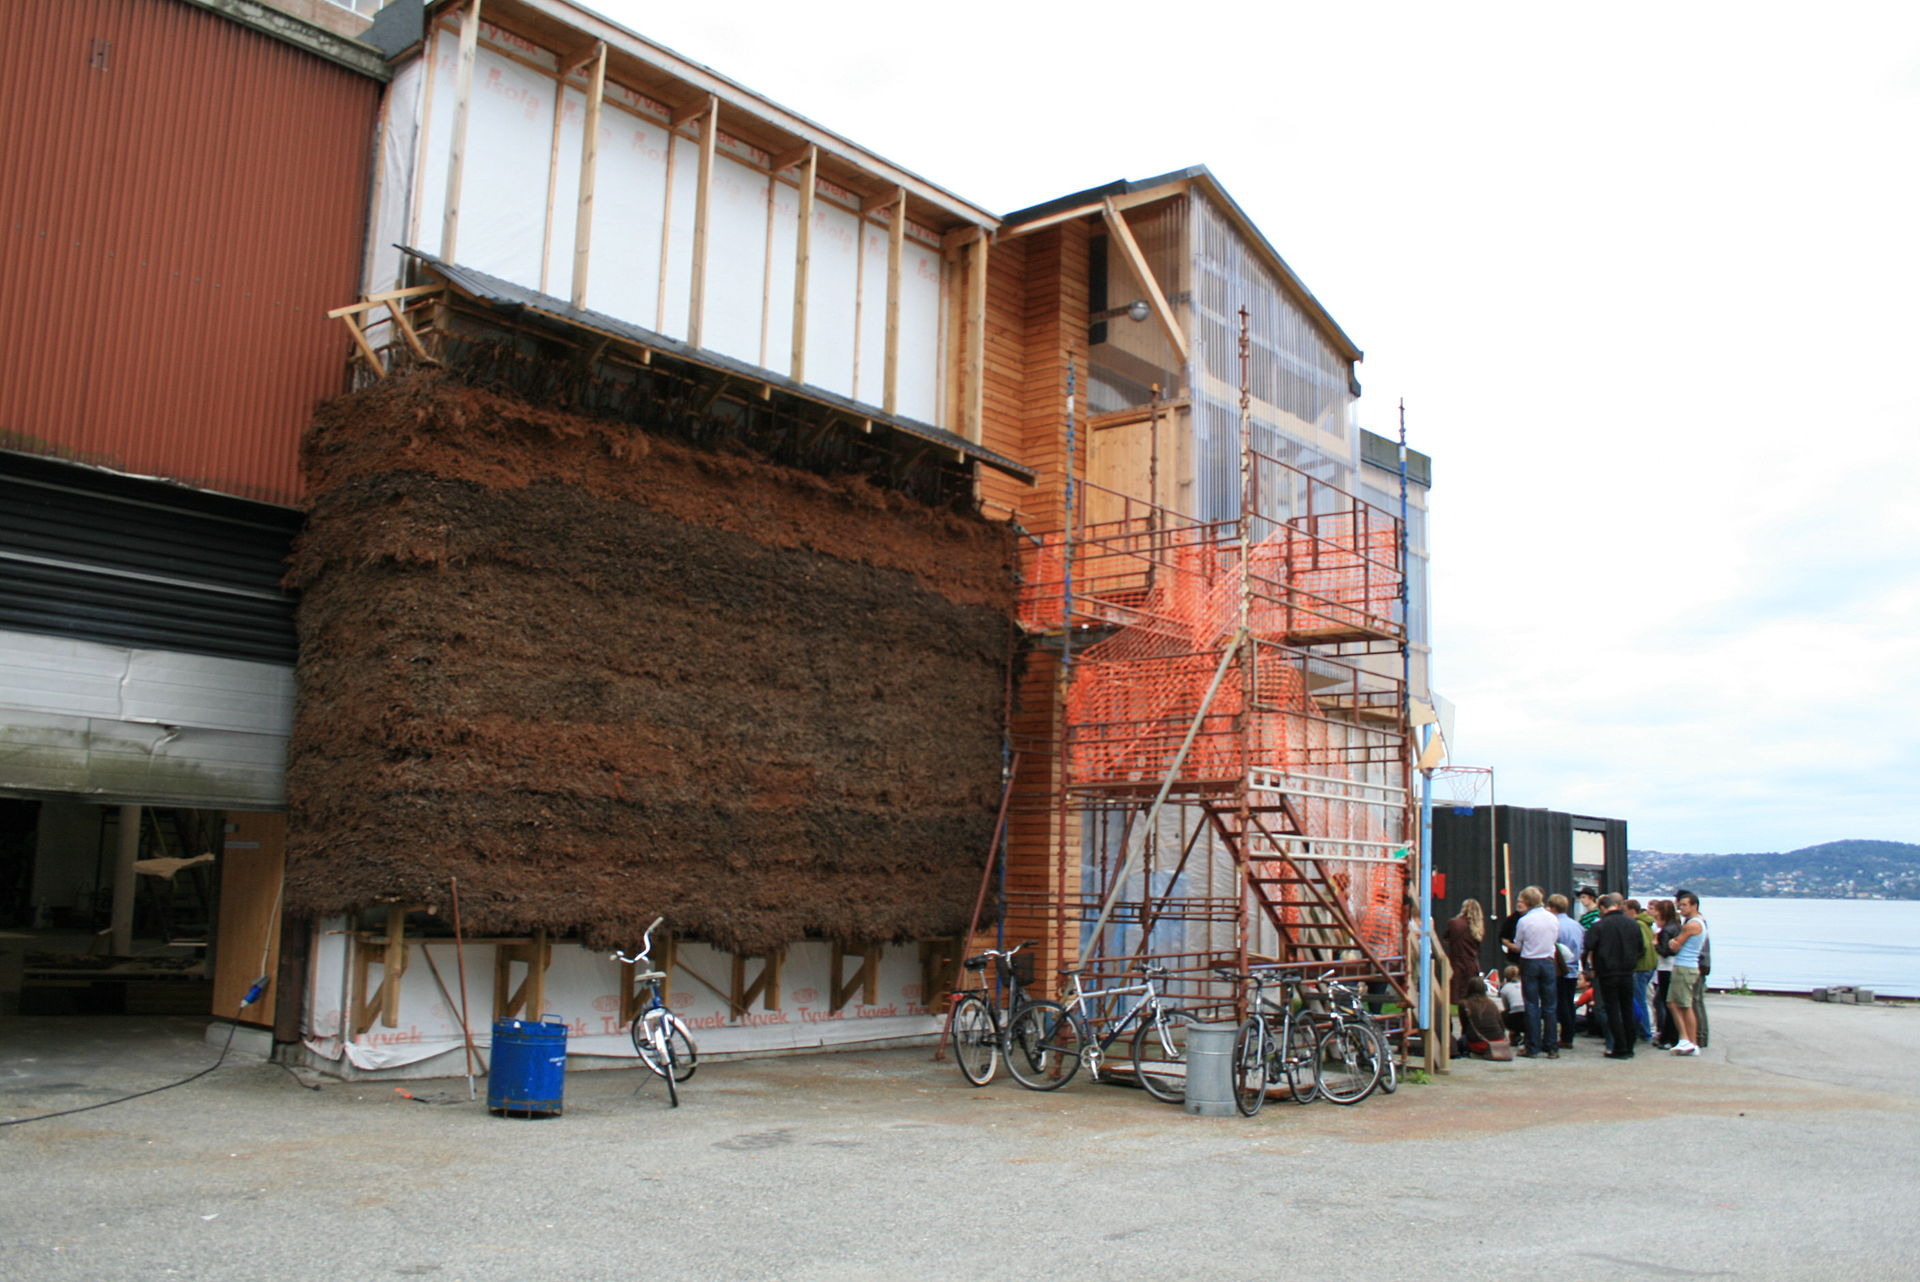 Escuela de arquitectura de bergen wikipedia la for Facultad arquitectura